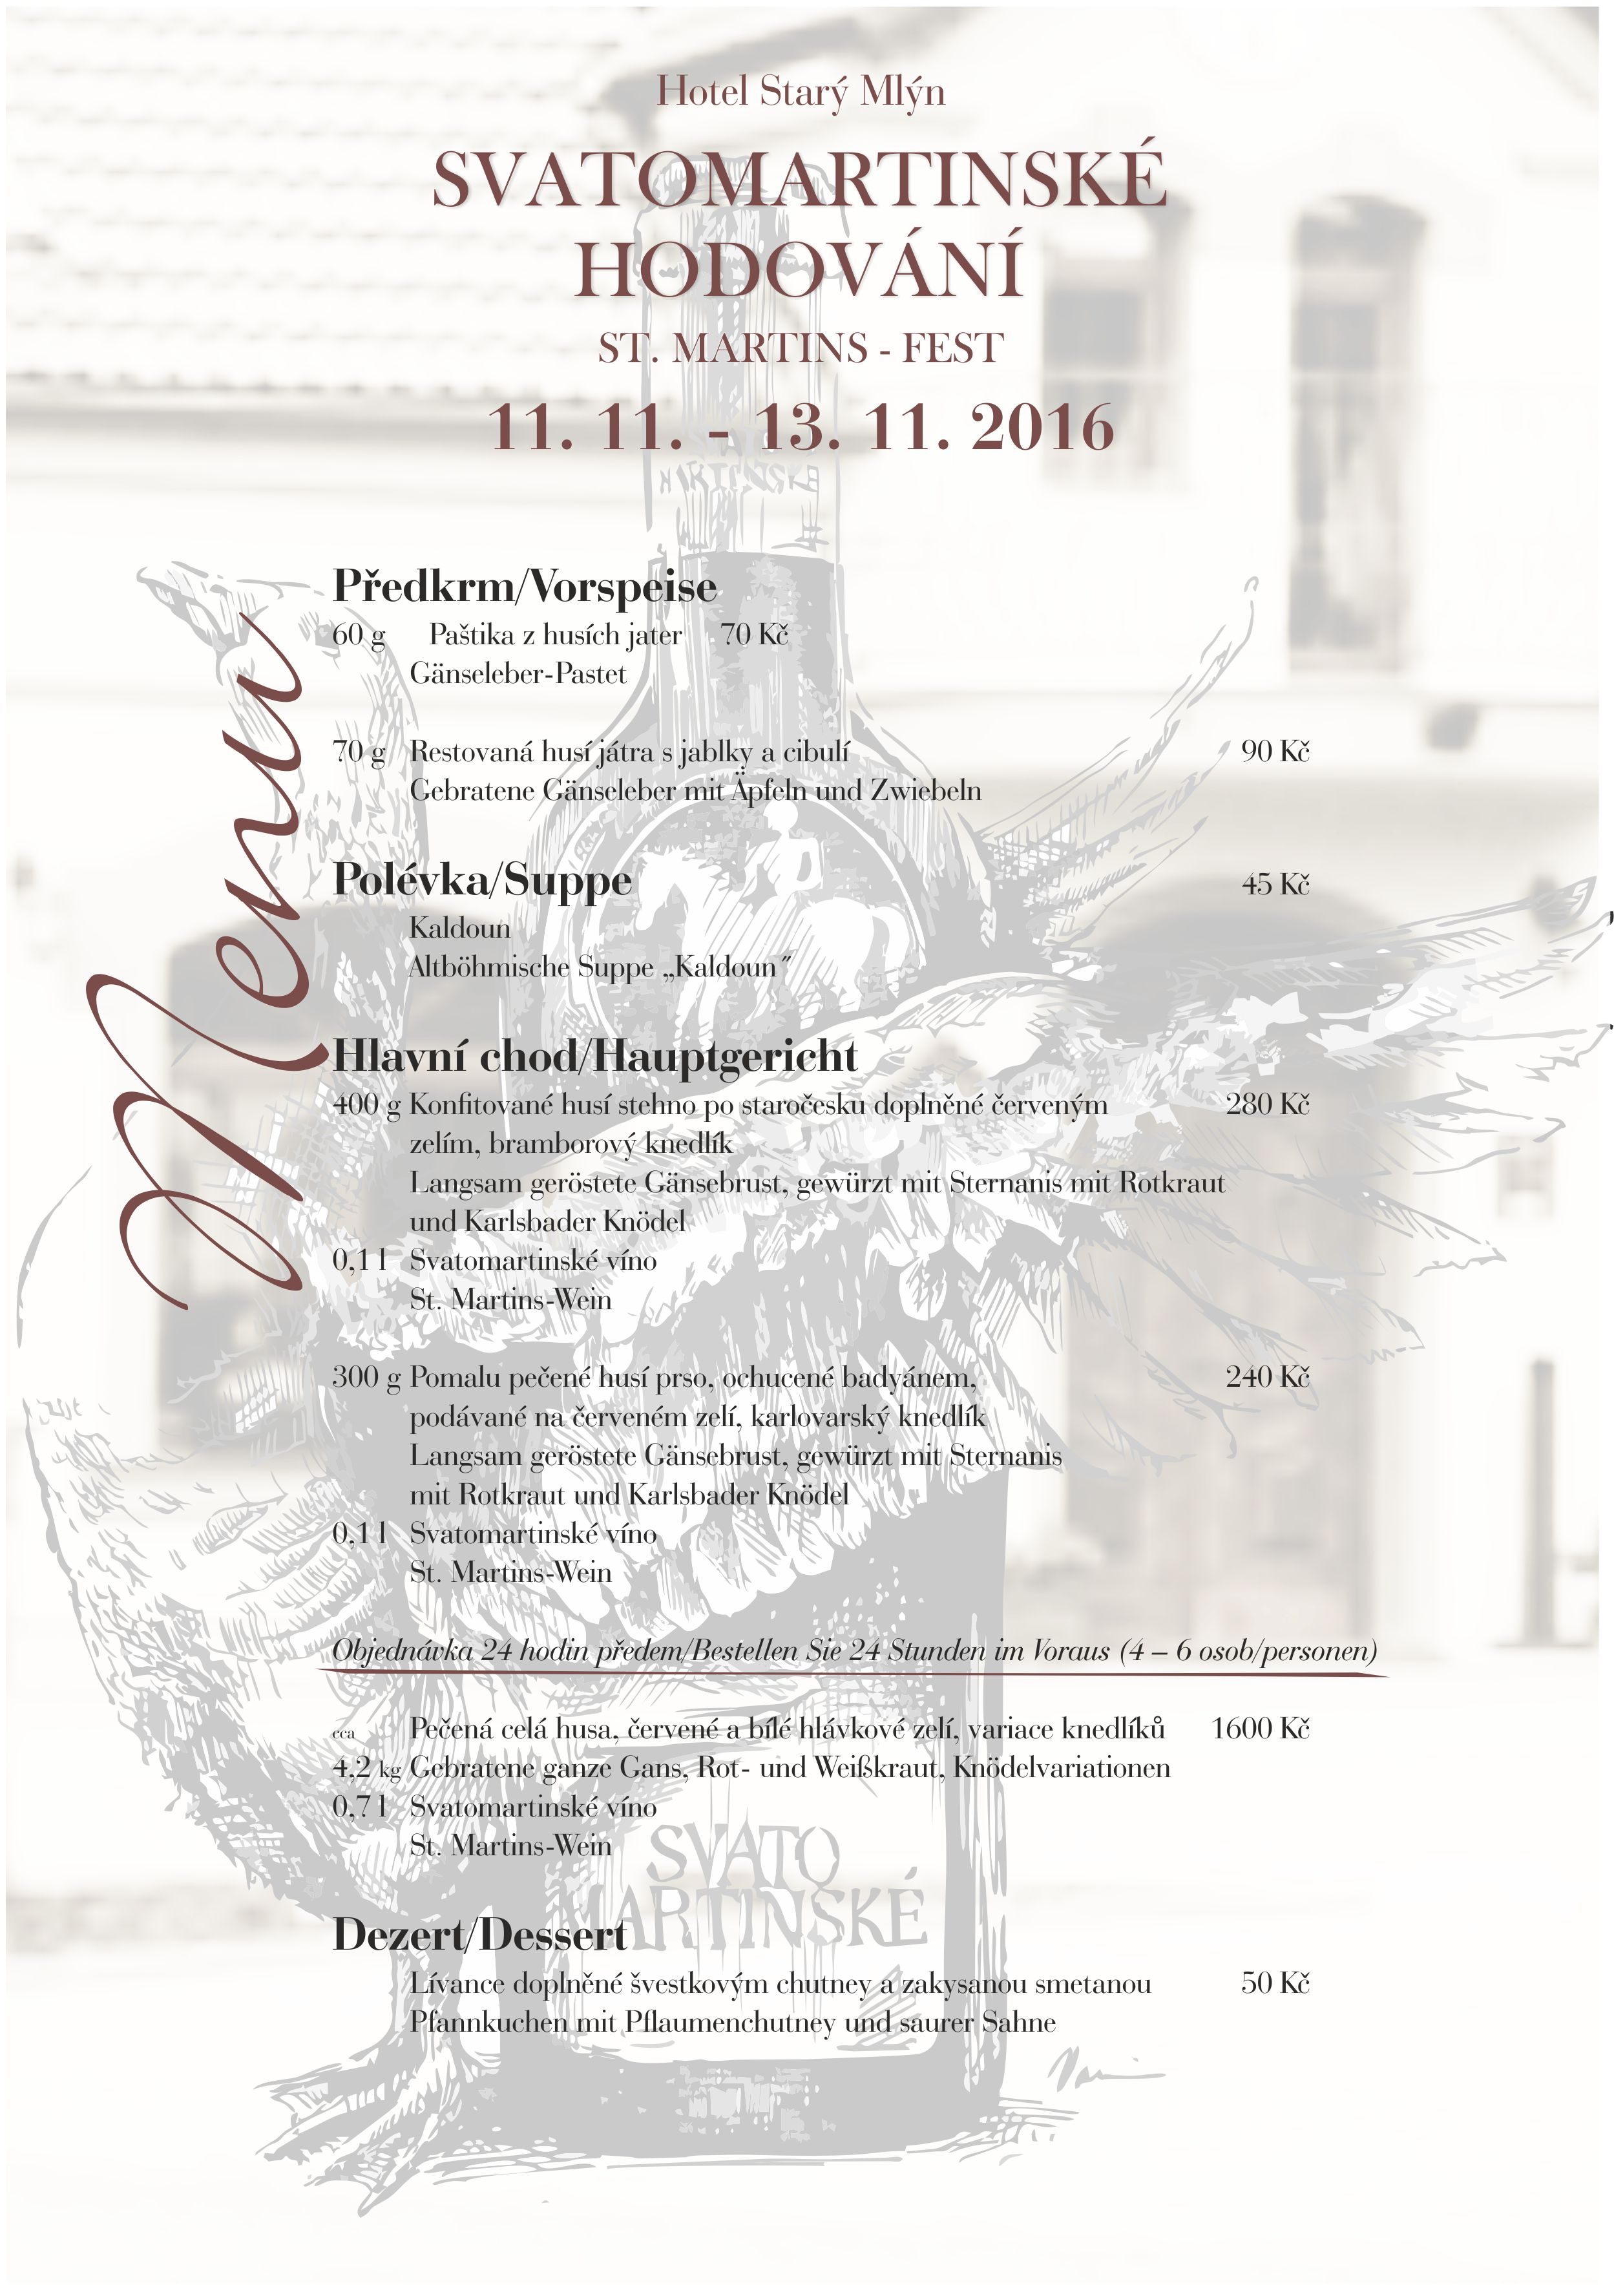 hody-sv-mar-2016